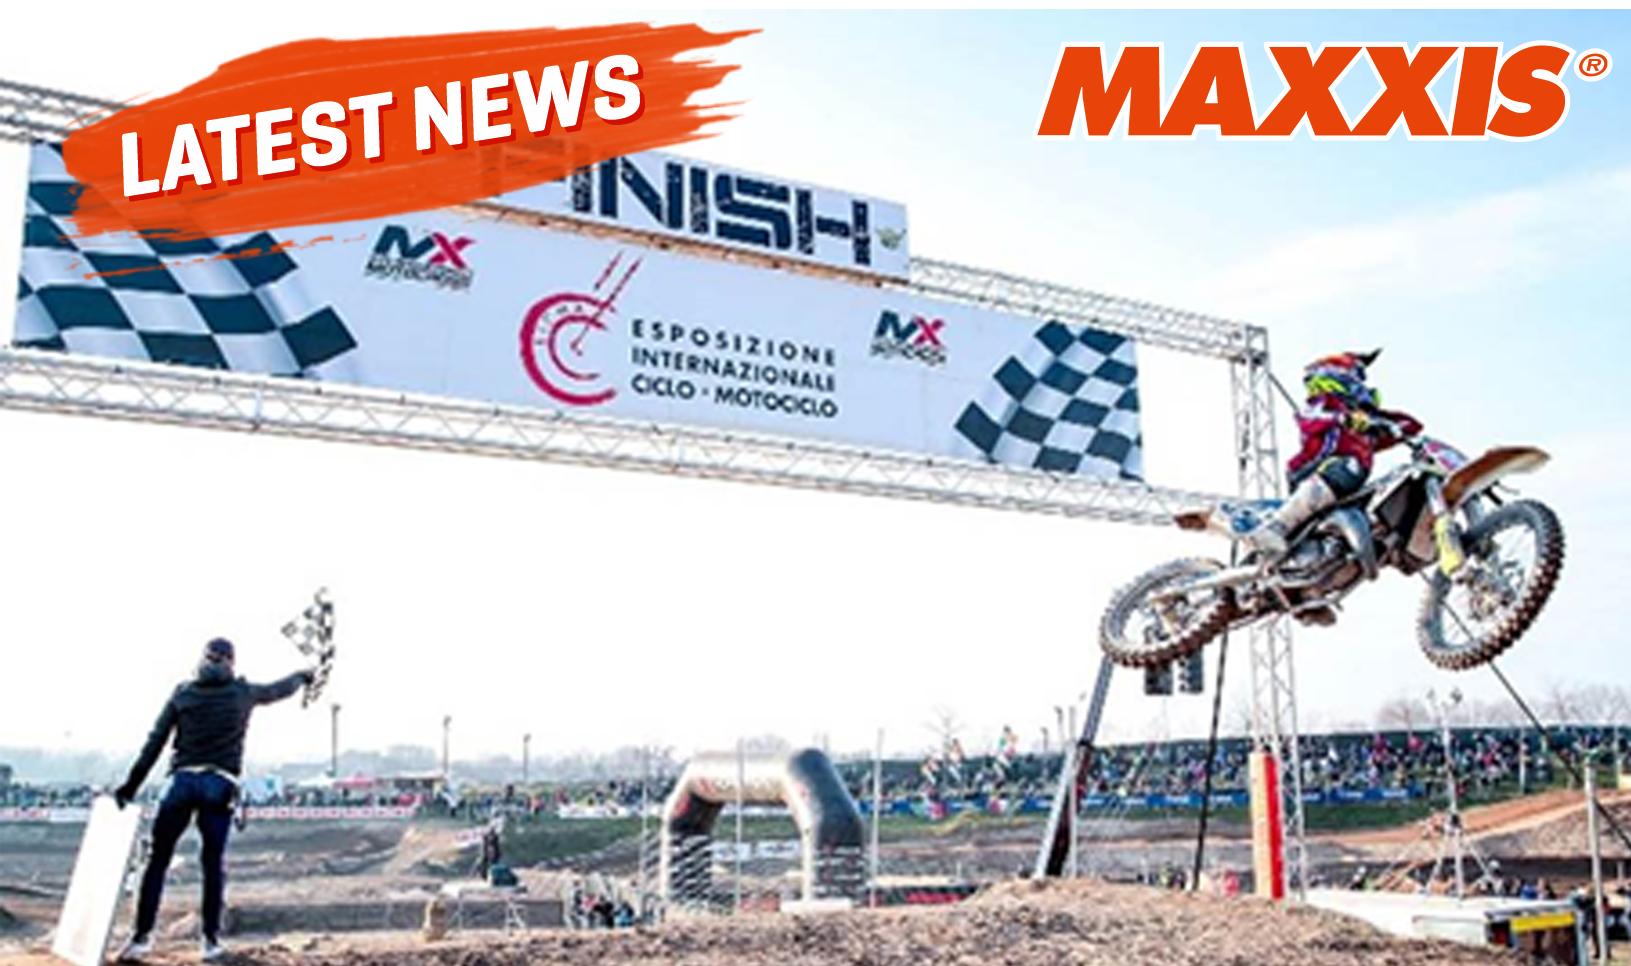 Mulai Lakukan Pemanasan, MAXXIS Siap Unjuk Gigi di MXGP 2020